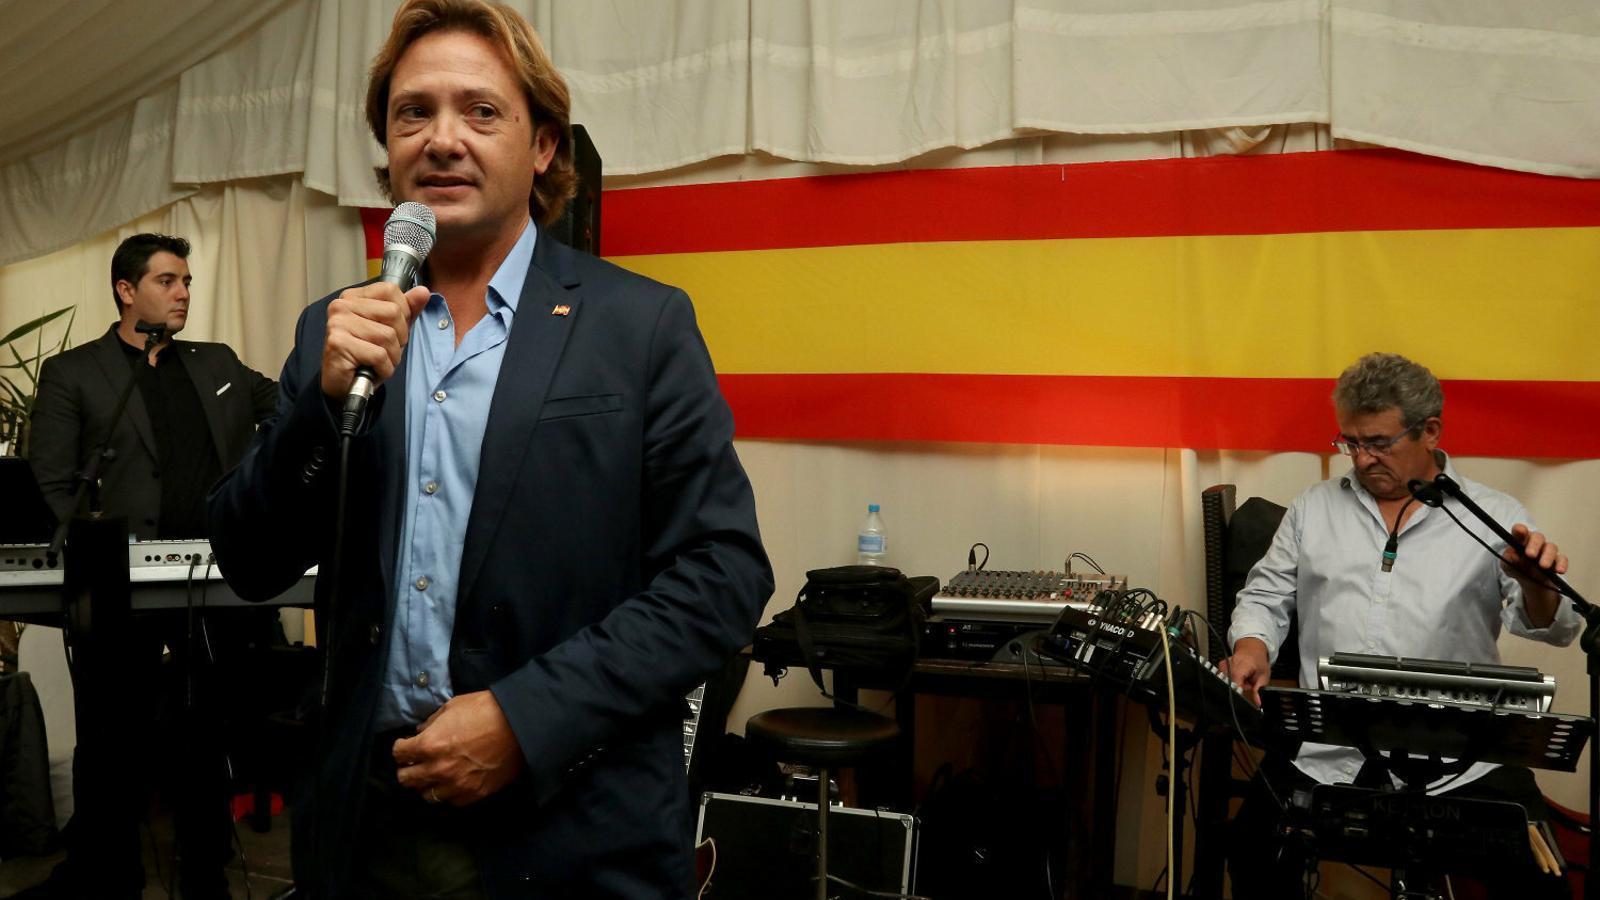 El líder de Vox, Jorge Campos.